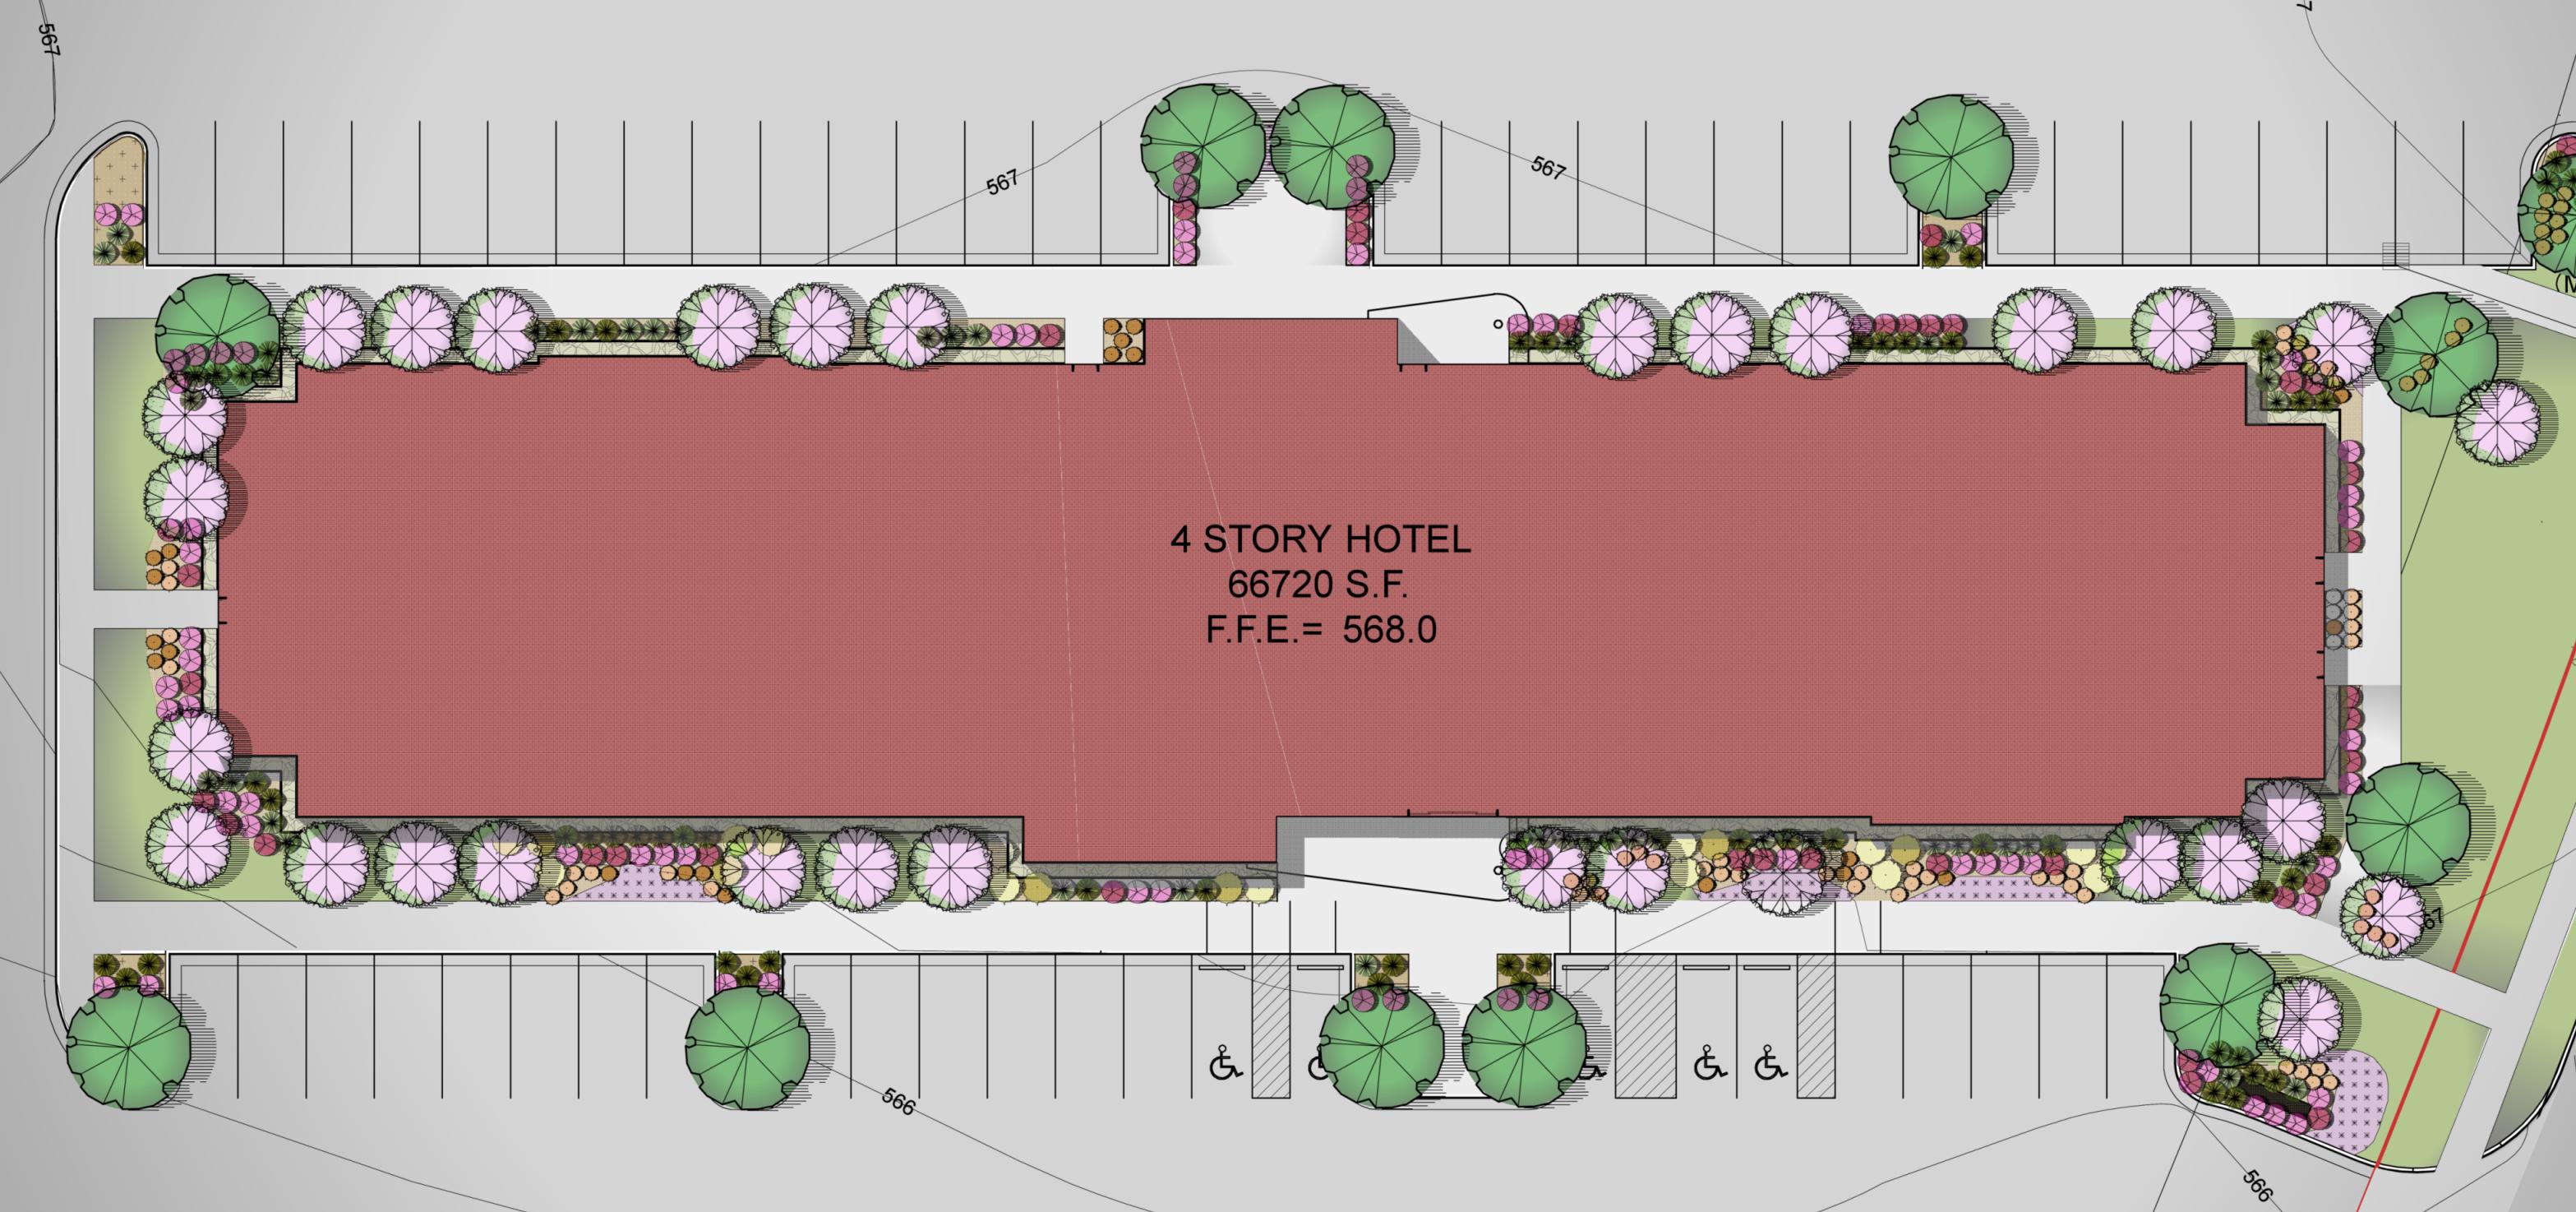 PiedmontHotel-Color-BuildingDtl.TCW